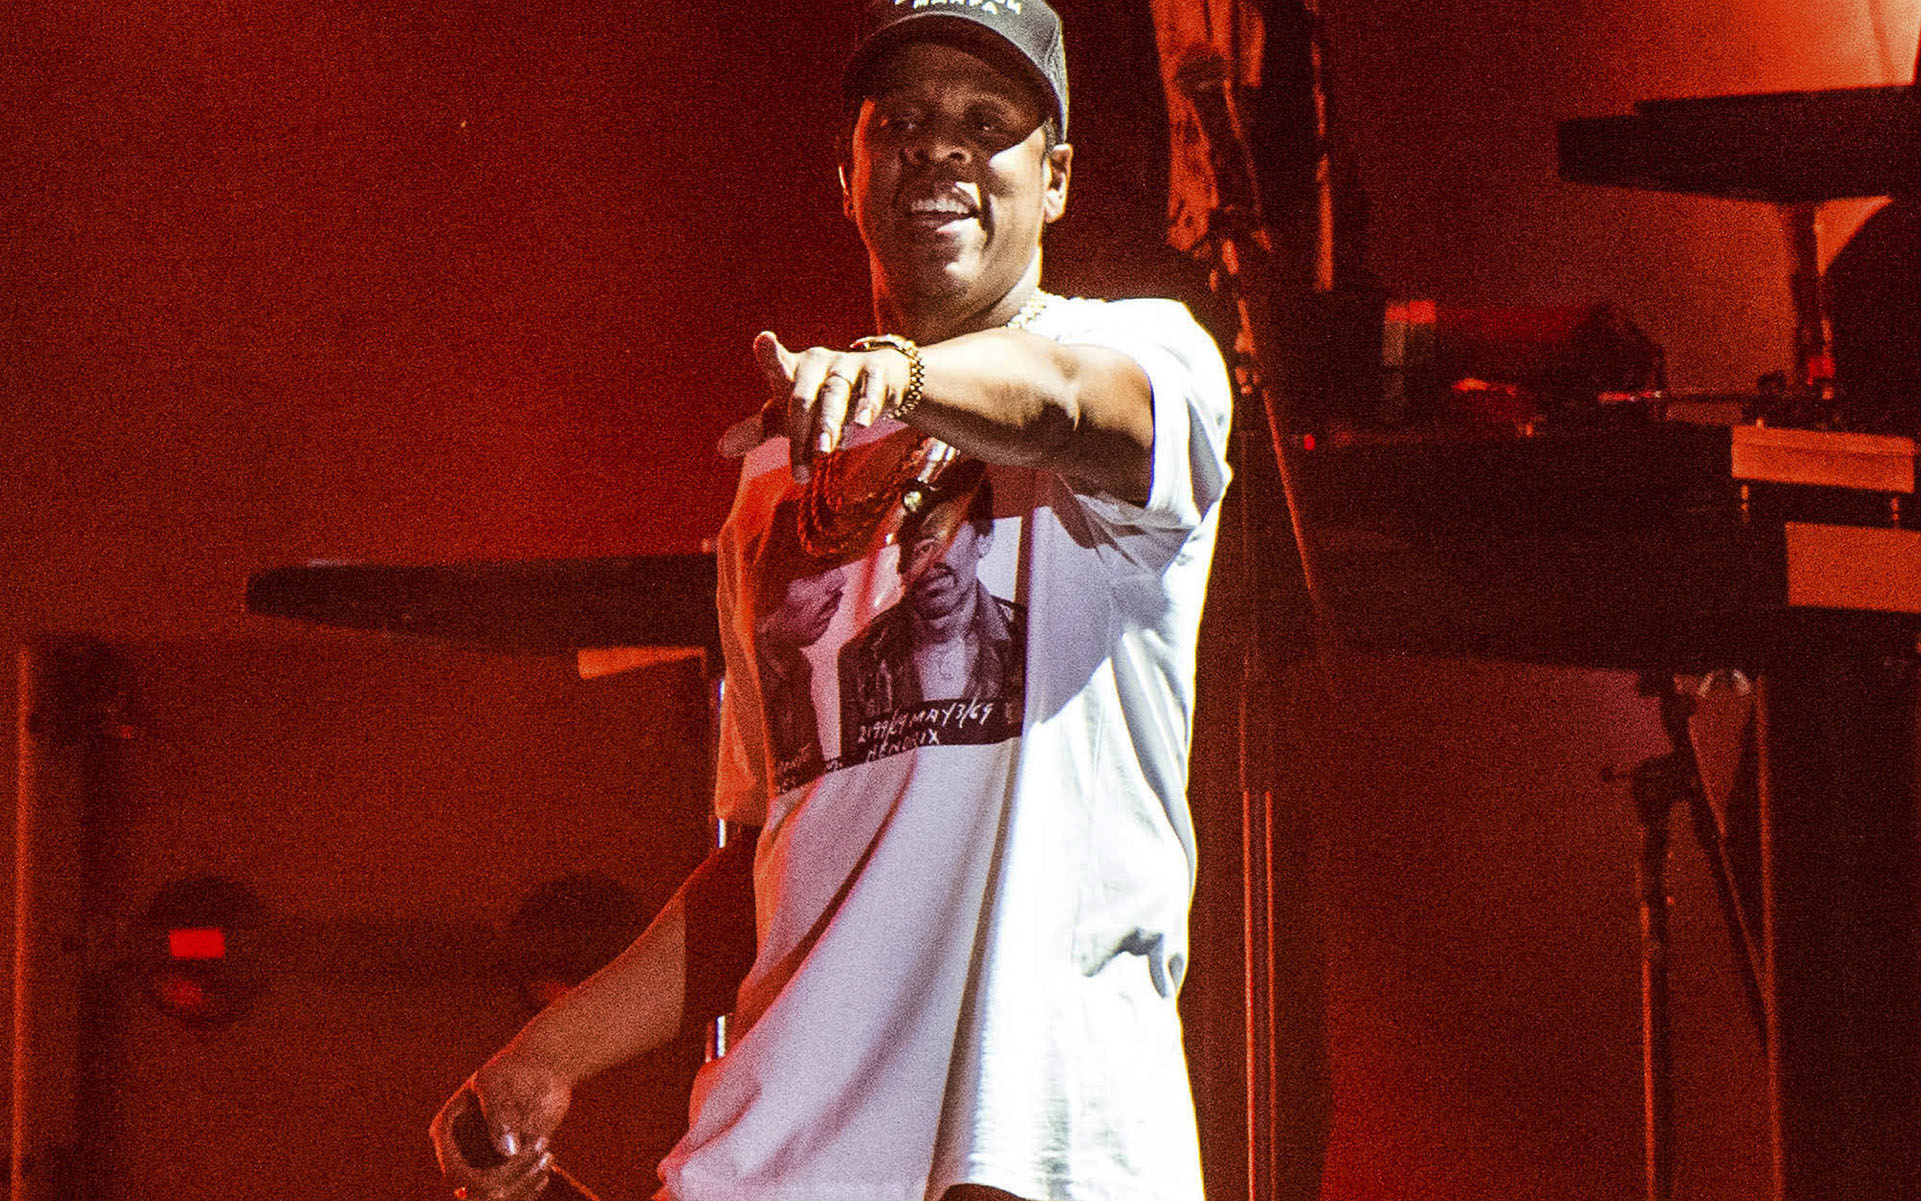 Feelin' It: Jay-Z Joins the Legal Cannabis Business thumbnail